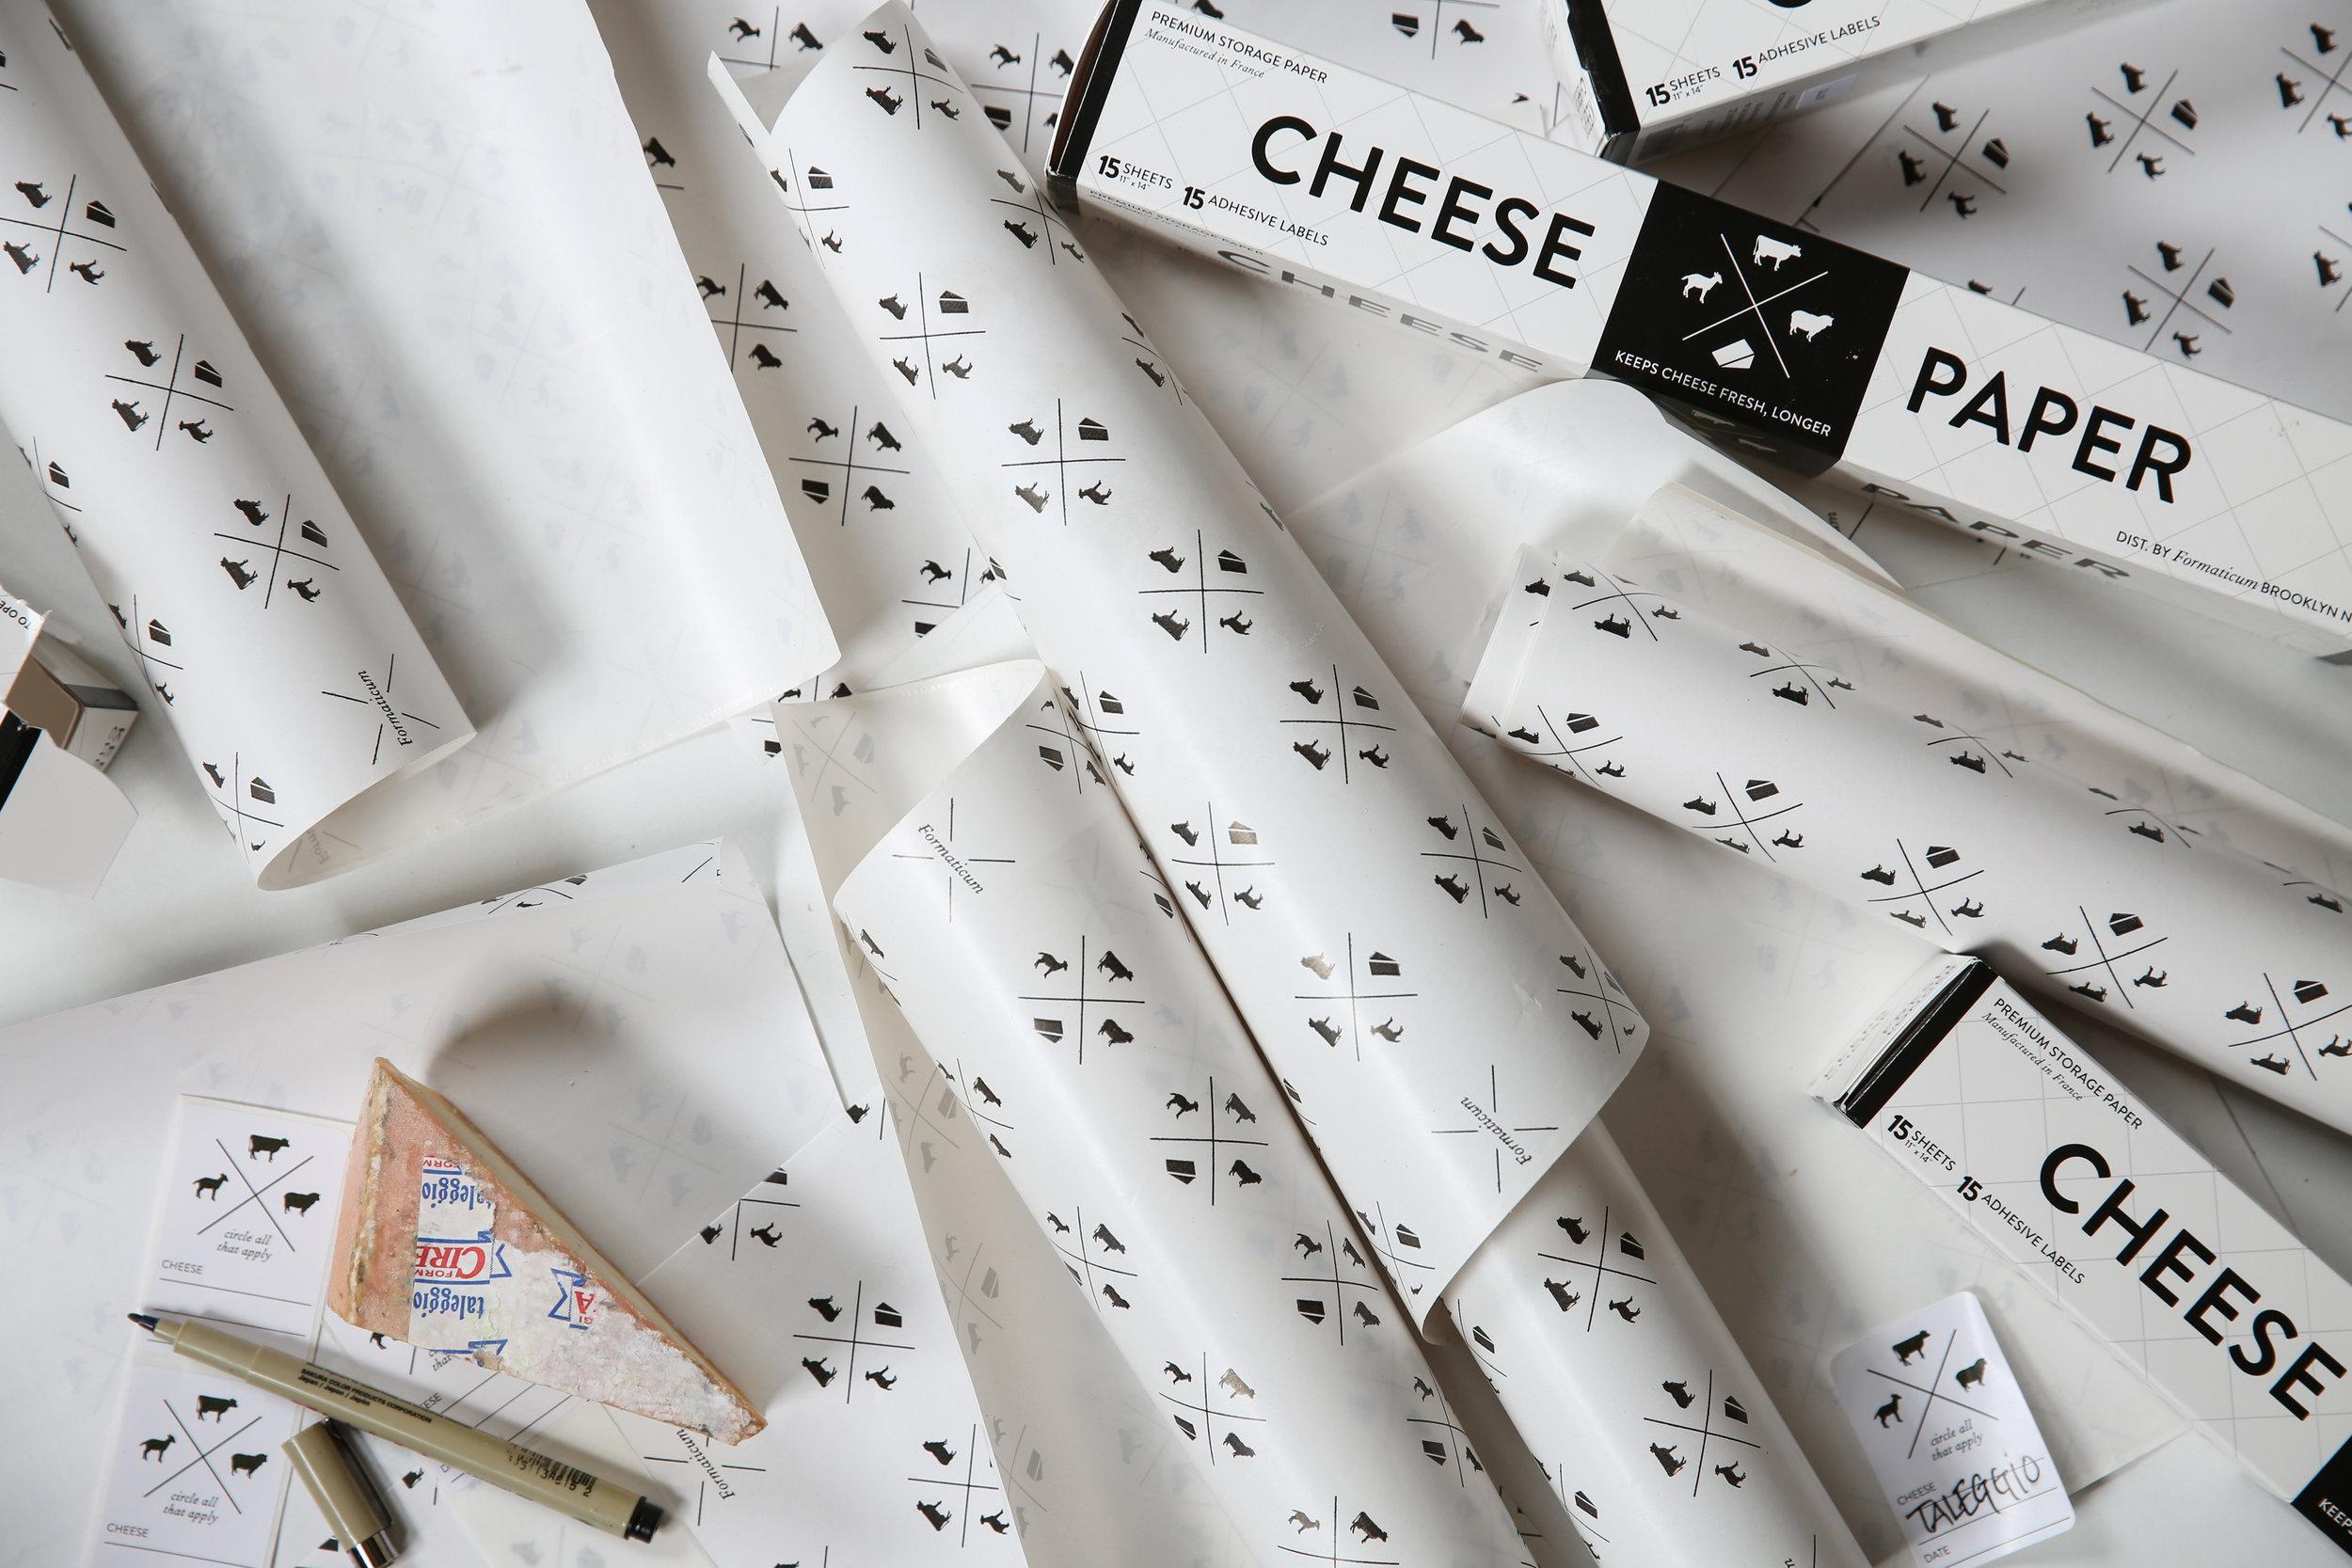 cheese-paper-FORMATICUM1308.jpg